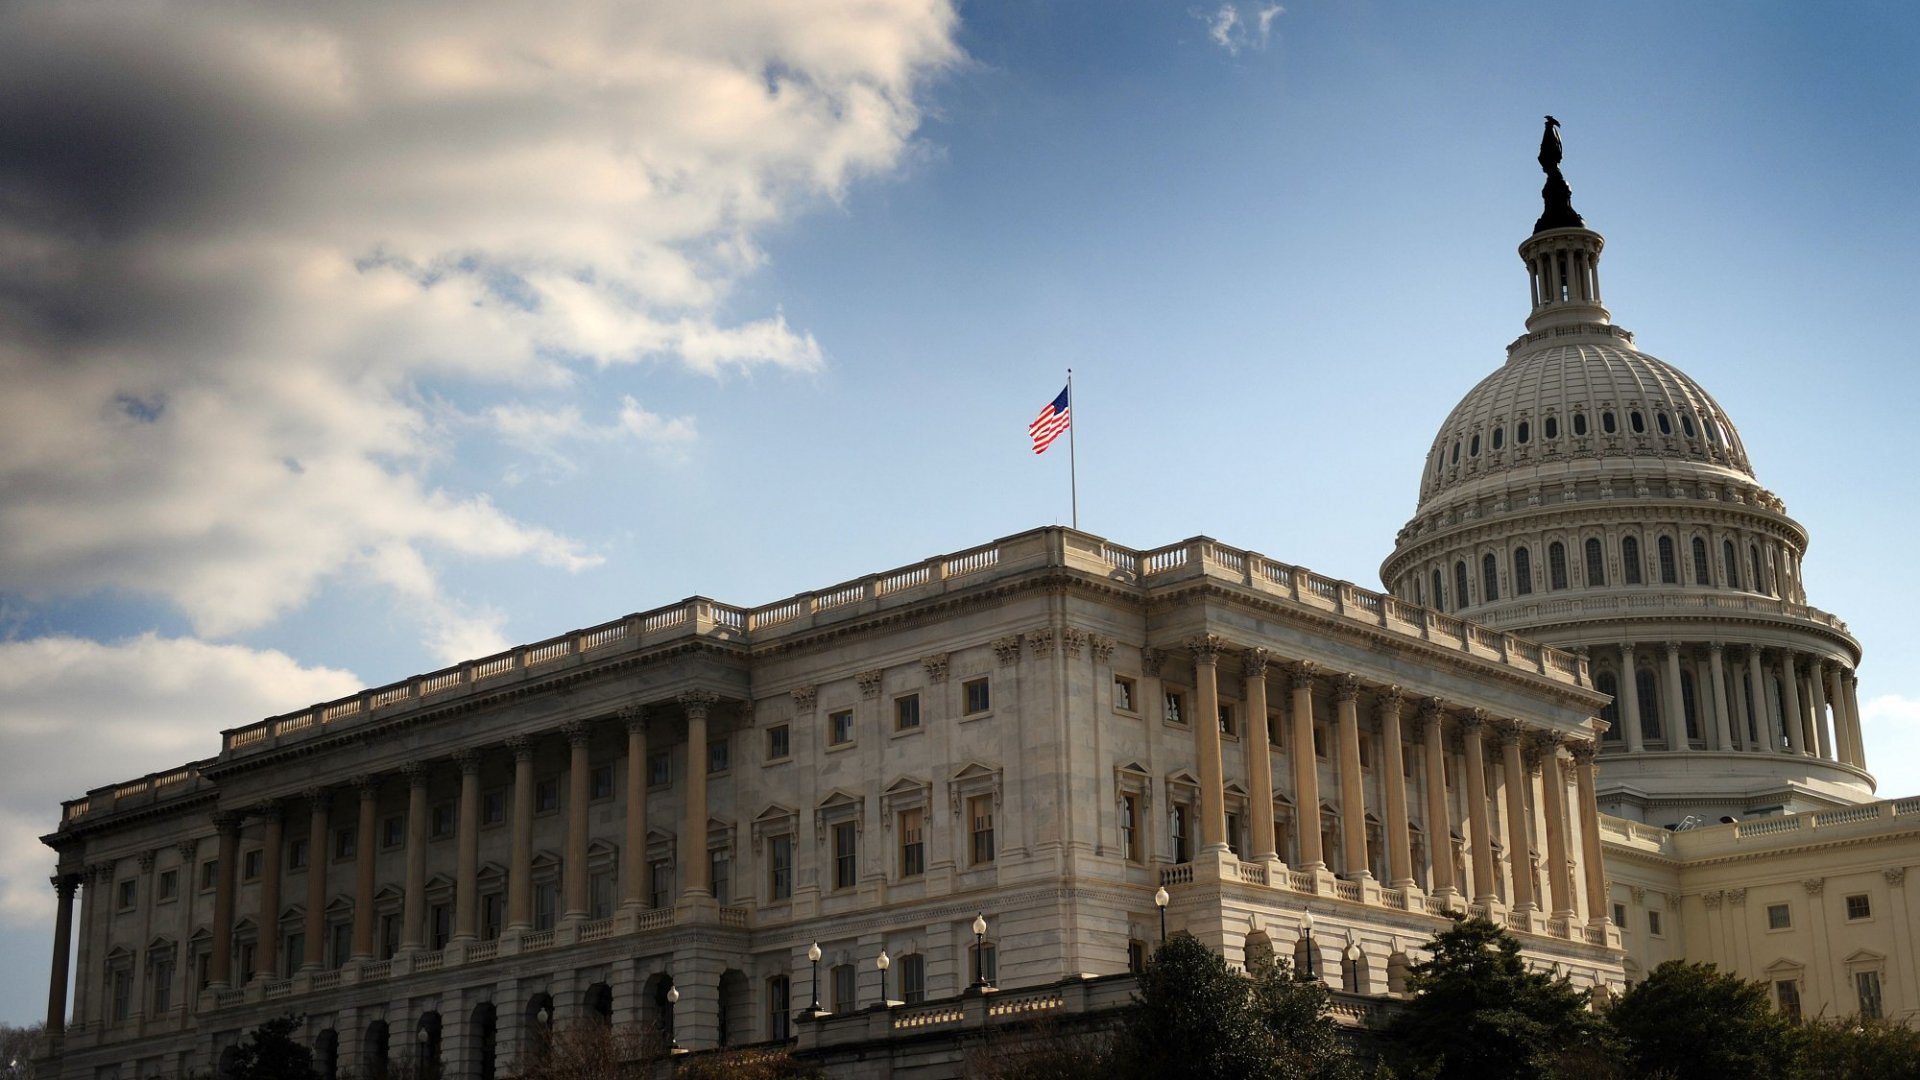 Senate Vote Propels Stopgap Spending Bill; More Votes Loom